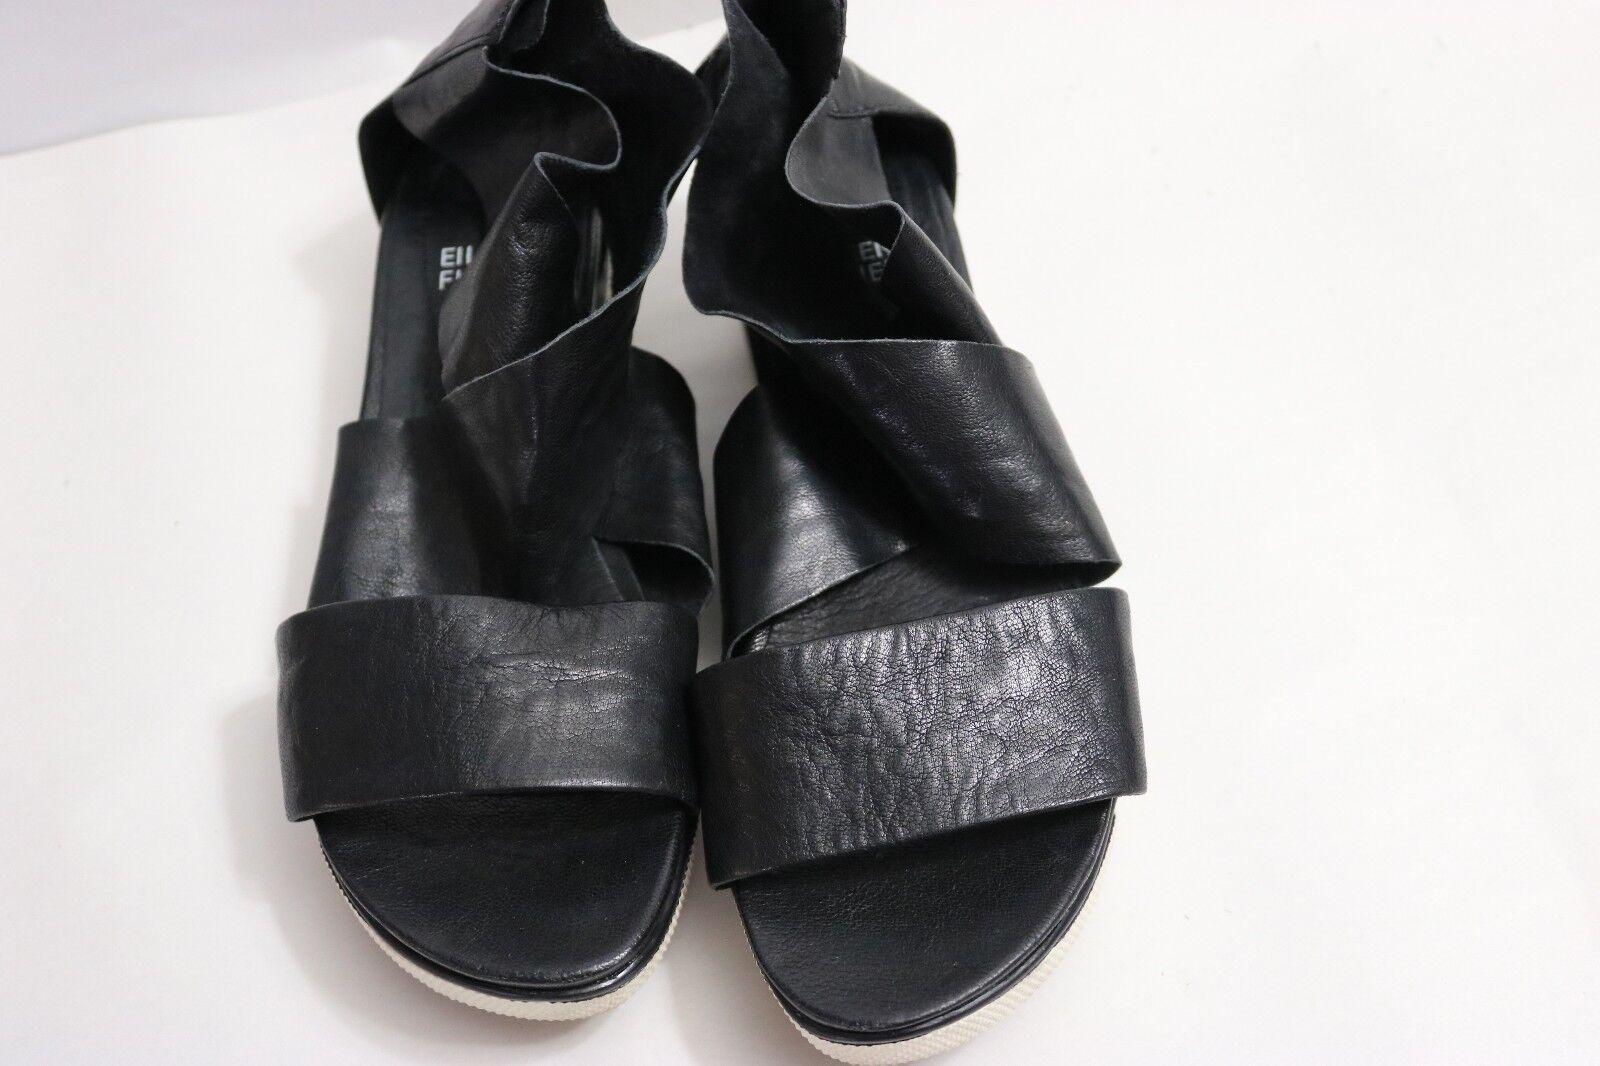 B-468  Women's Eileen Fisher Sport Platform Black Leather Sandal Size 7  1 2 M